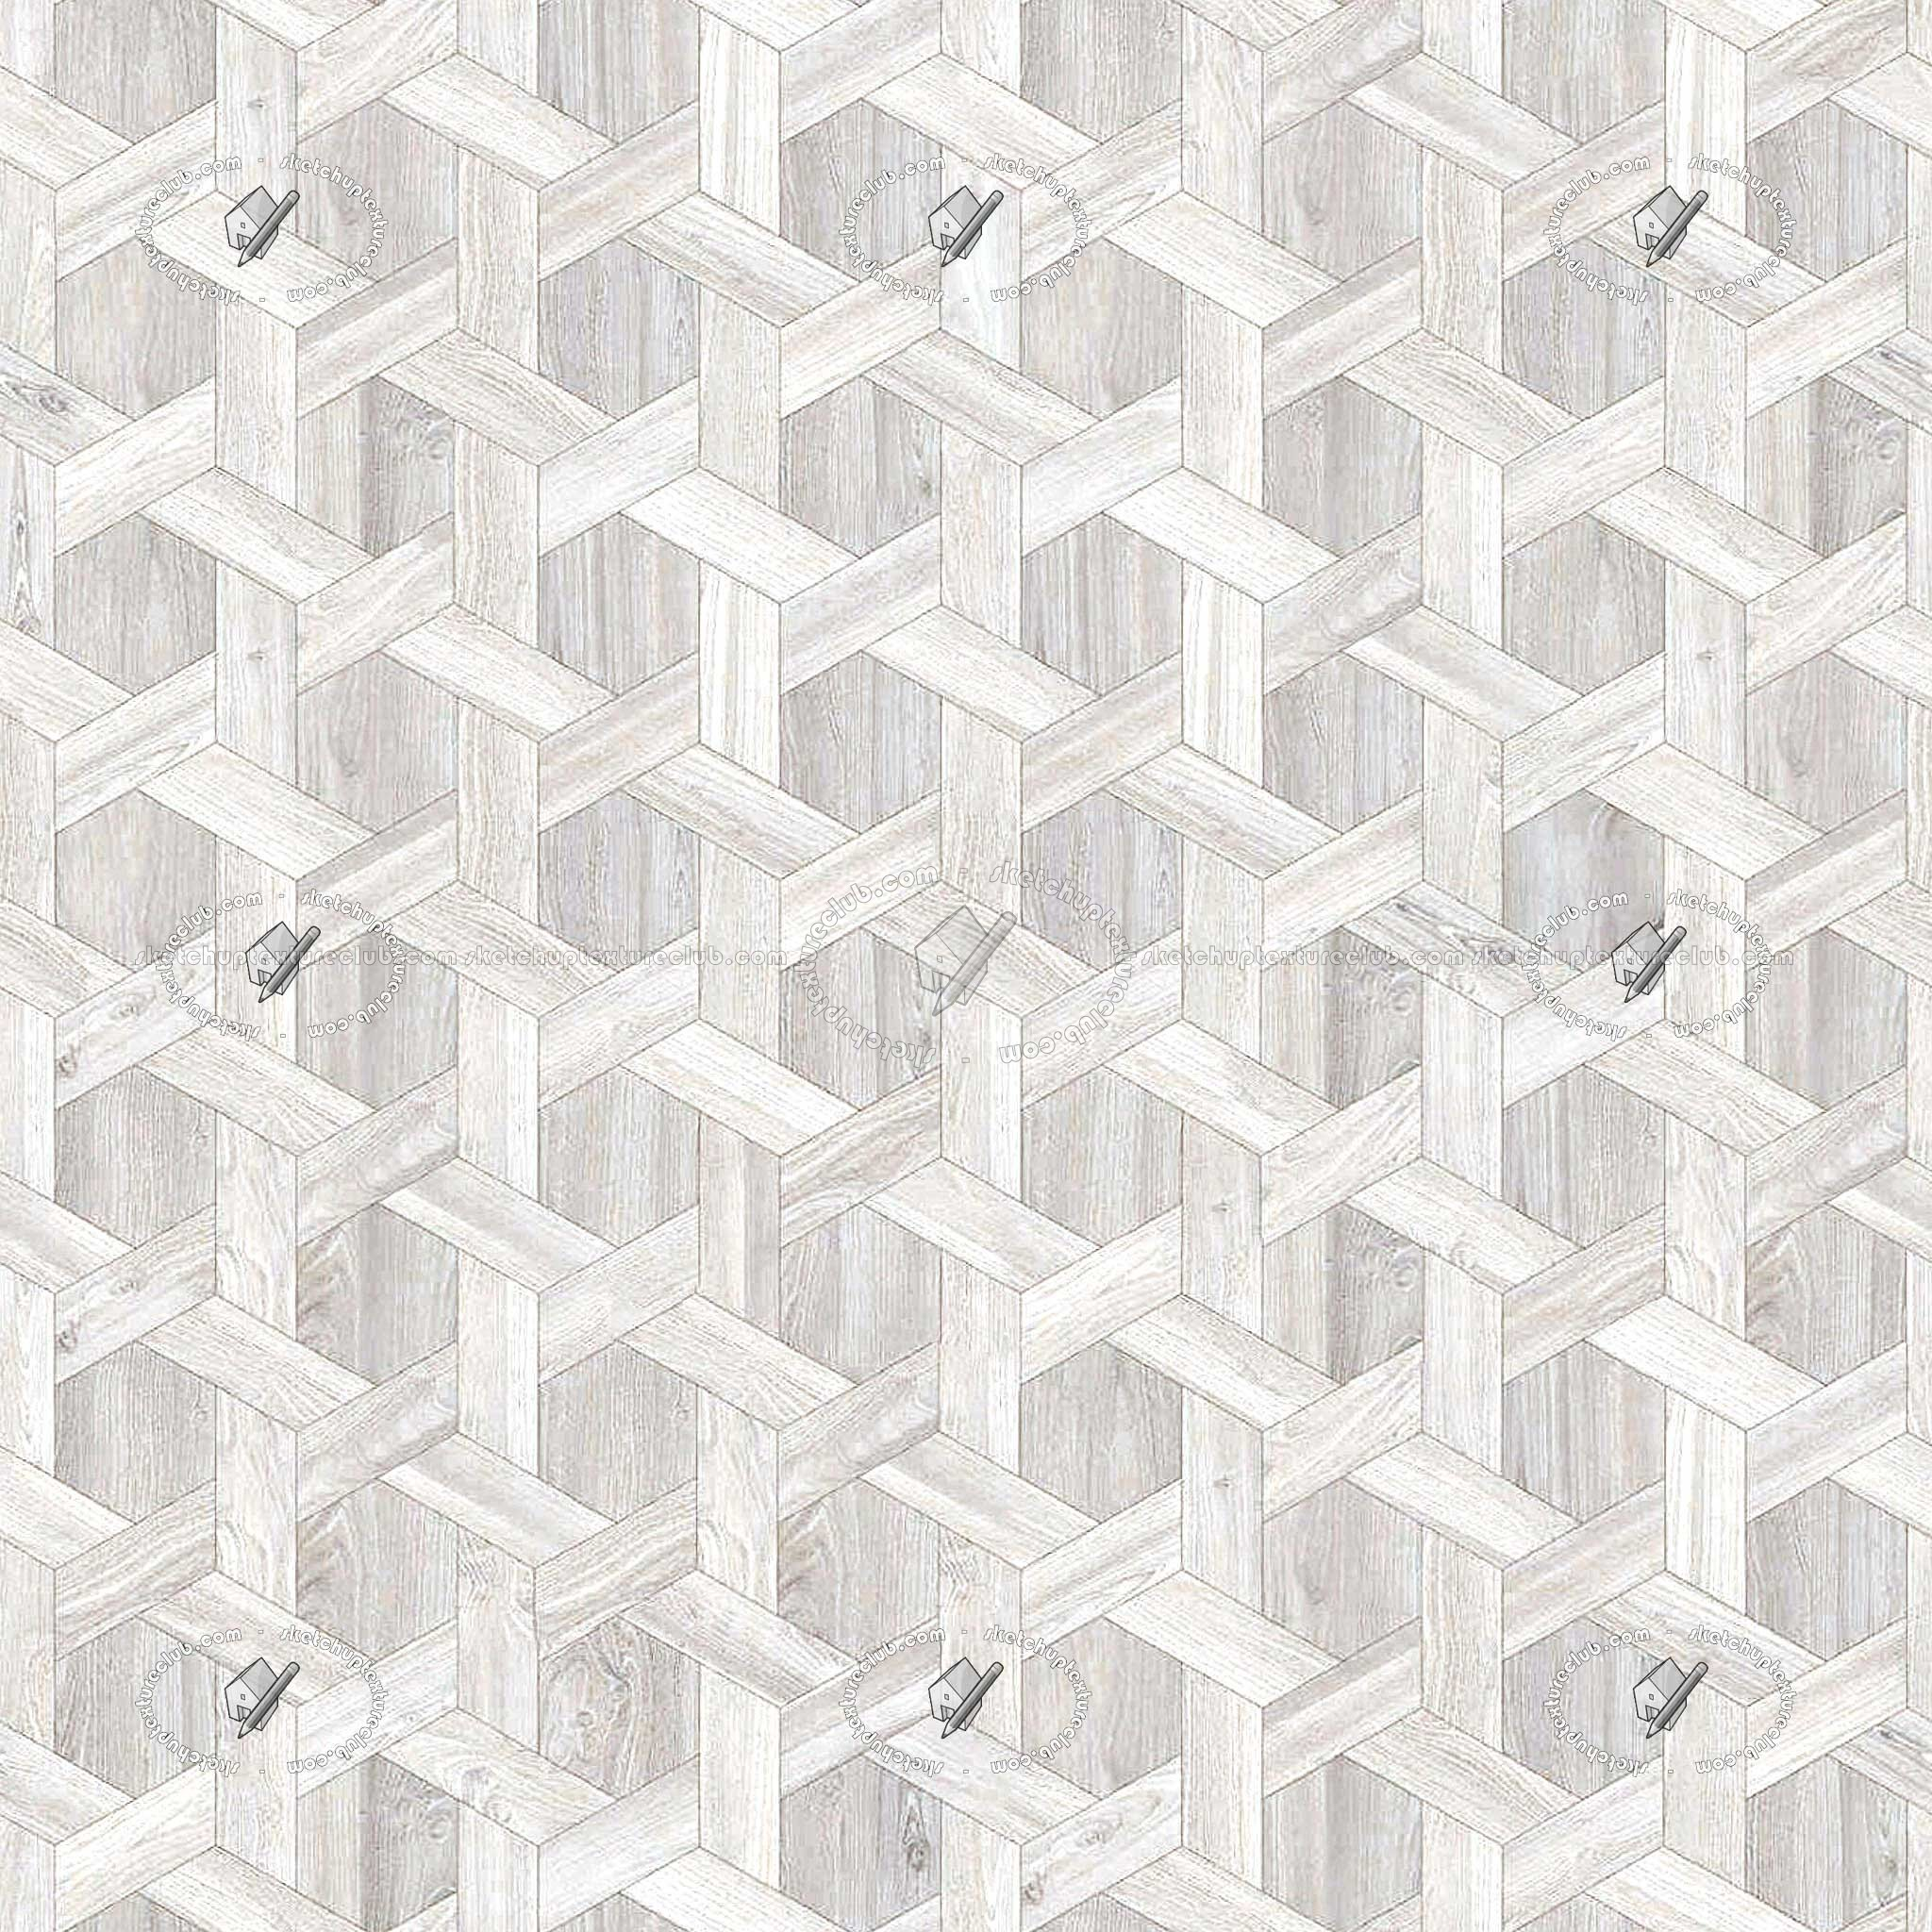 2048x2048 Wood Floor White Parquet Textures Seamless